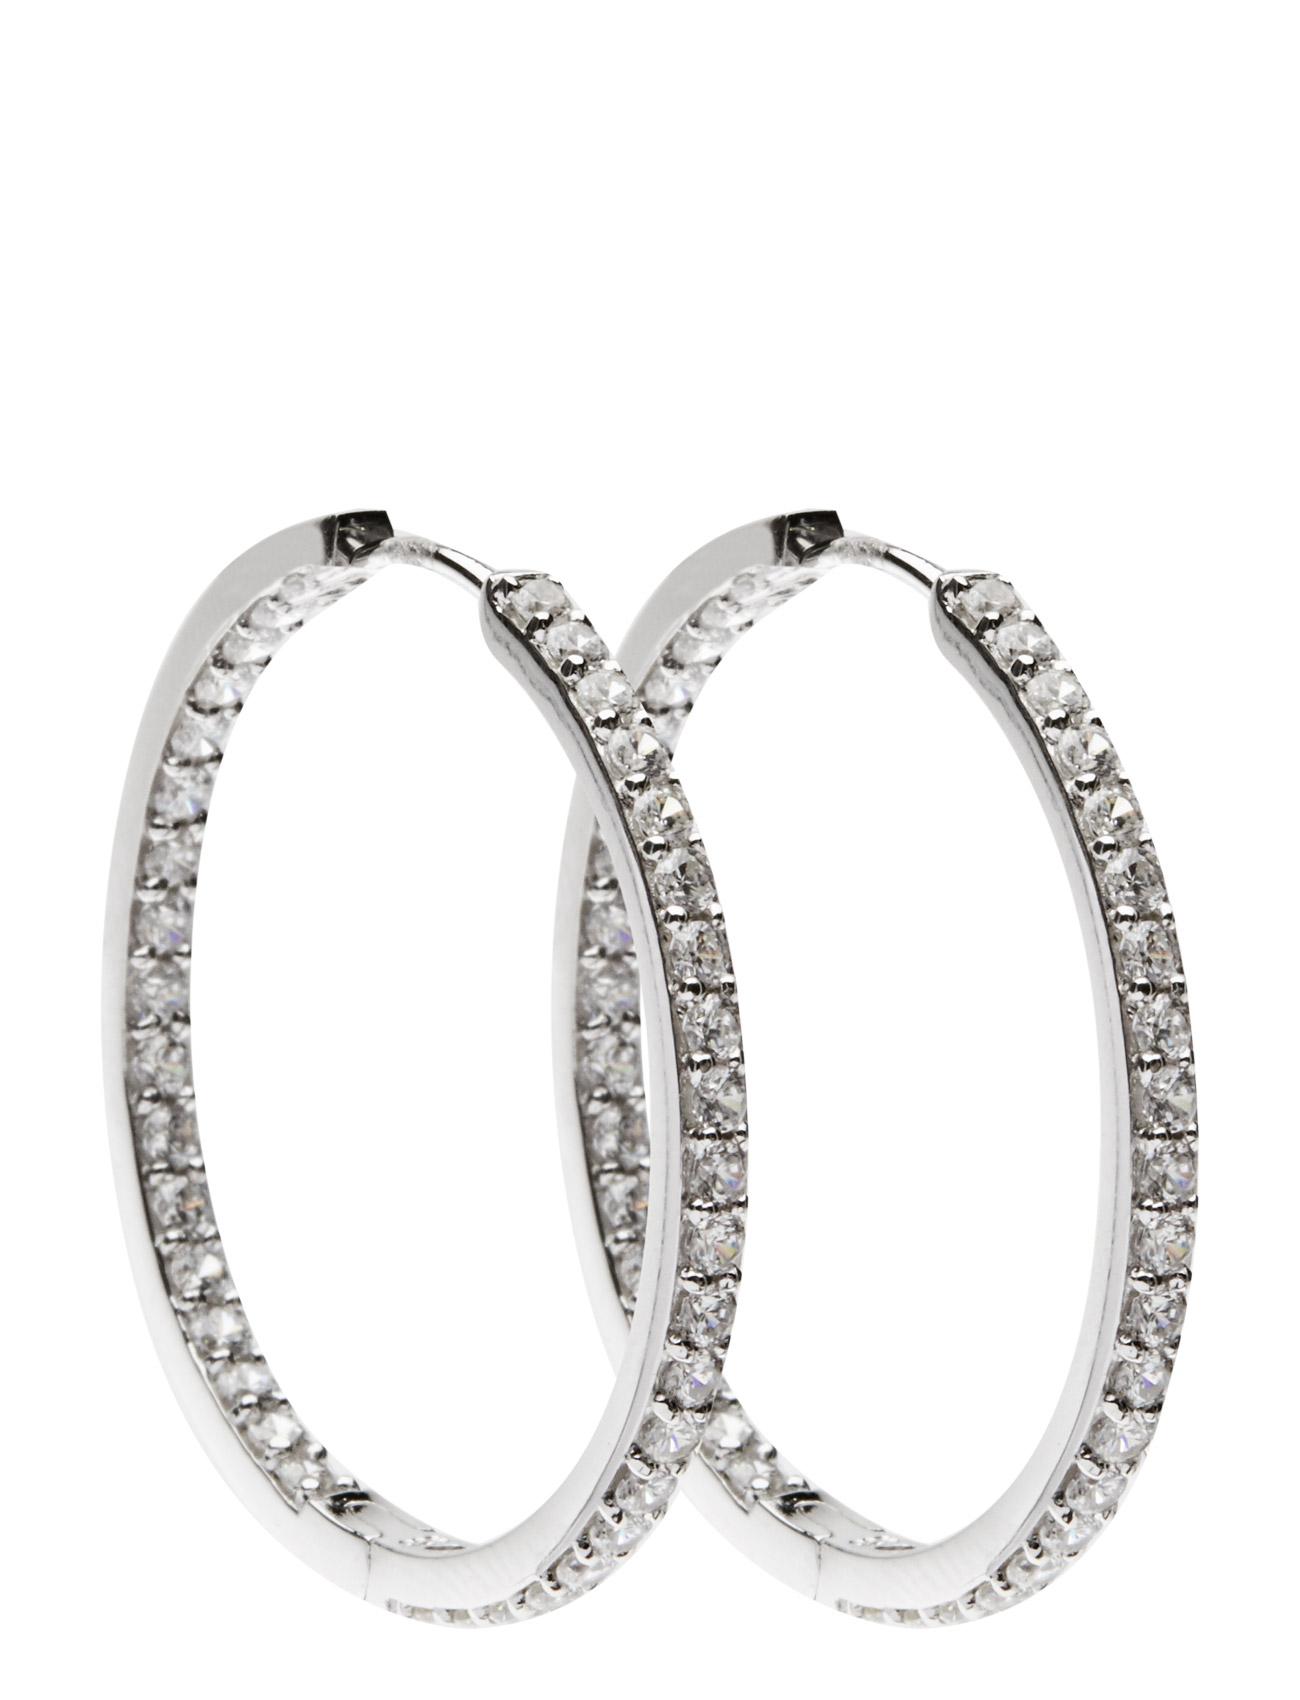 Bovalino Earrings Sif Jakobs Jewellery Accessories til Kvinder i